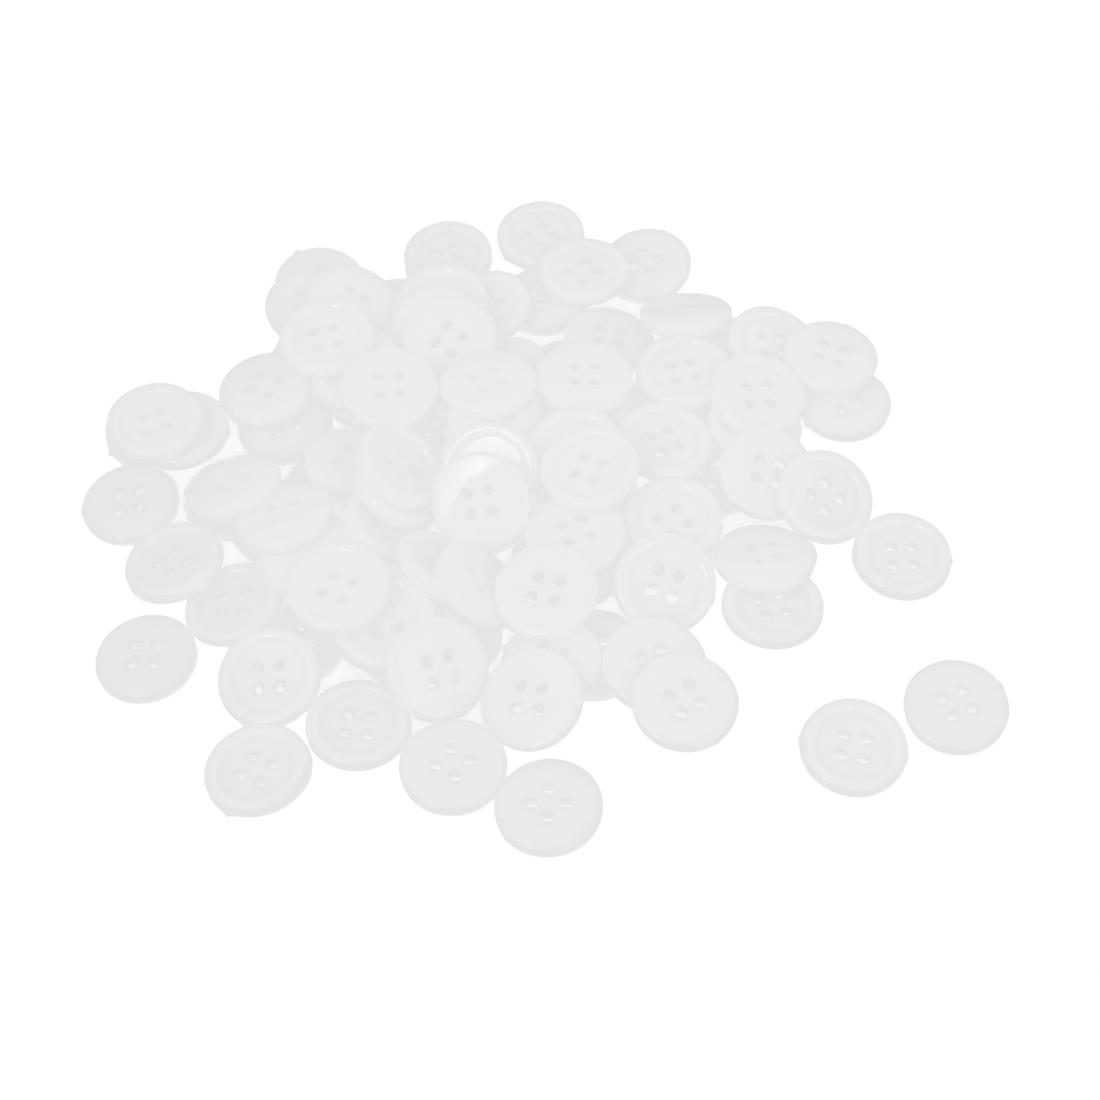 15mm Dia Nylon Round 4-Hole Sewing Clothing Clothes Shirt Button White 100pcs